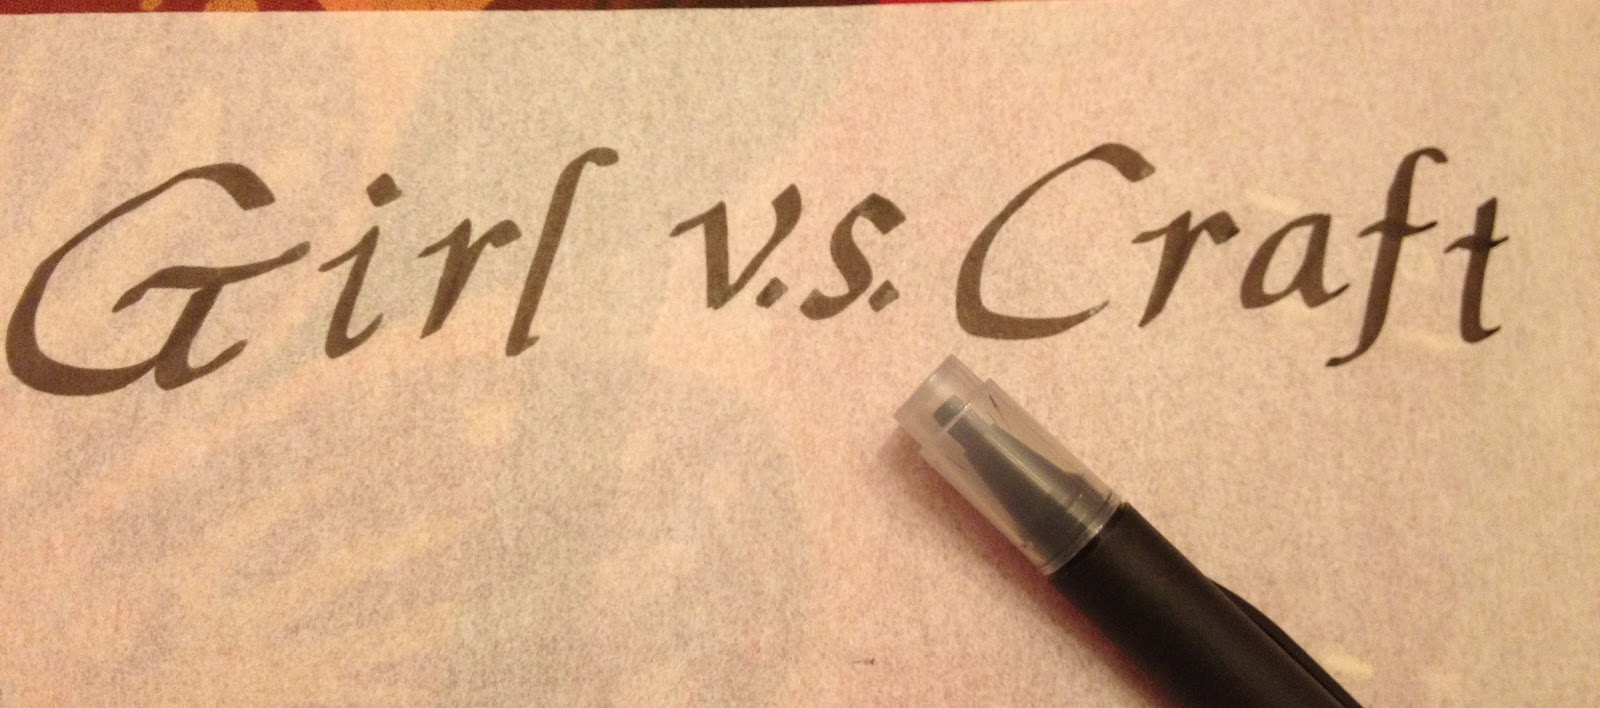 Girl Vs Craft Girls Vs Calligraphy